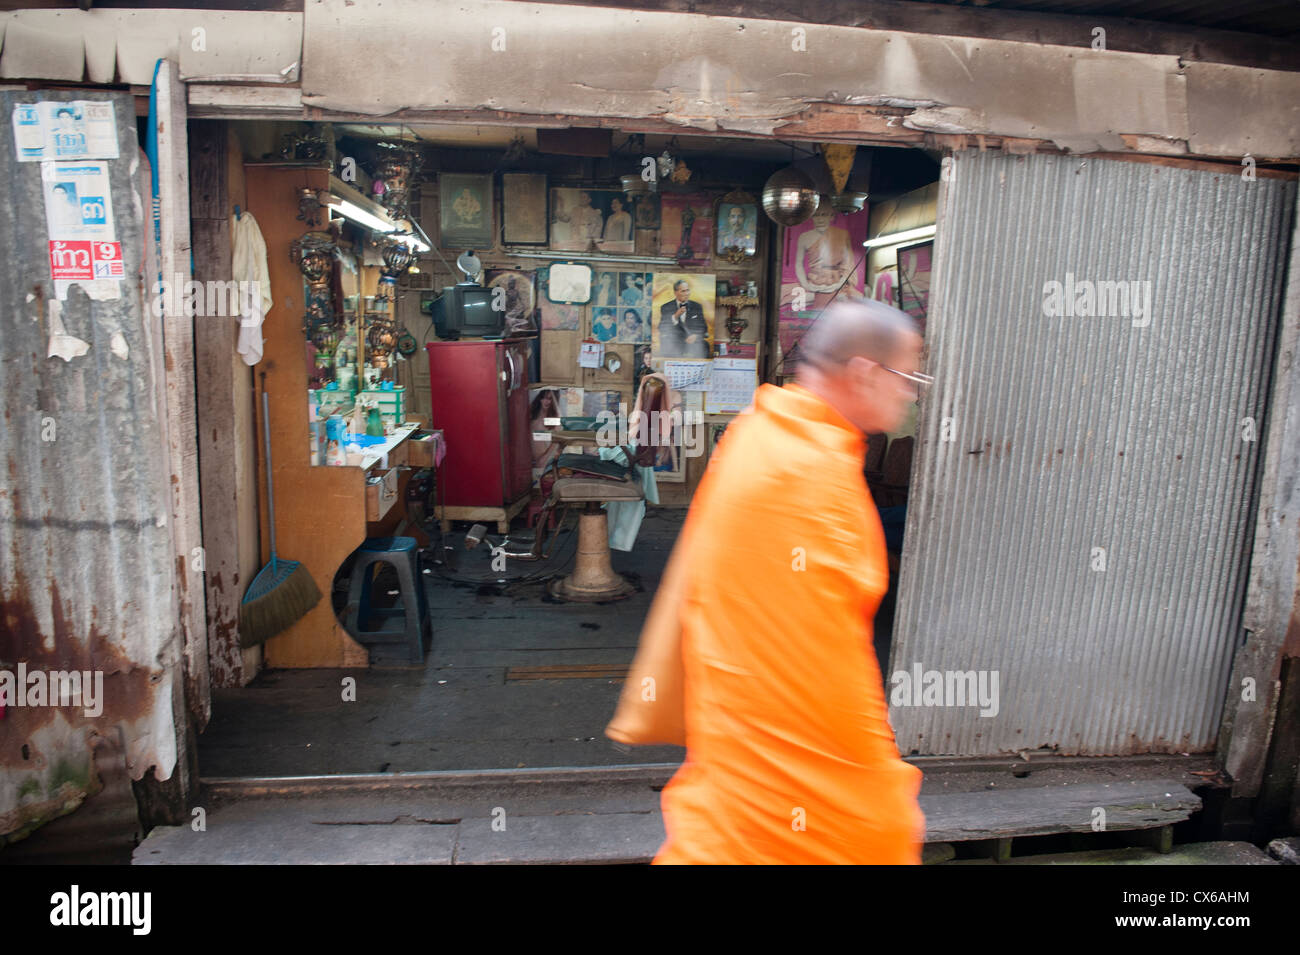 Visit to Baan Sinlapin on the West side of Bangkok in the Khlong Bang Luang artist village. - Stock Image